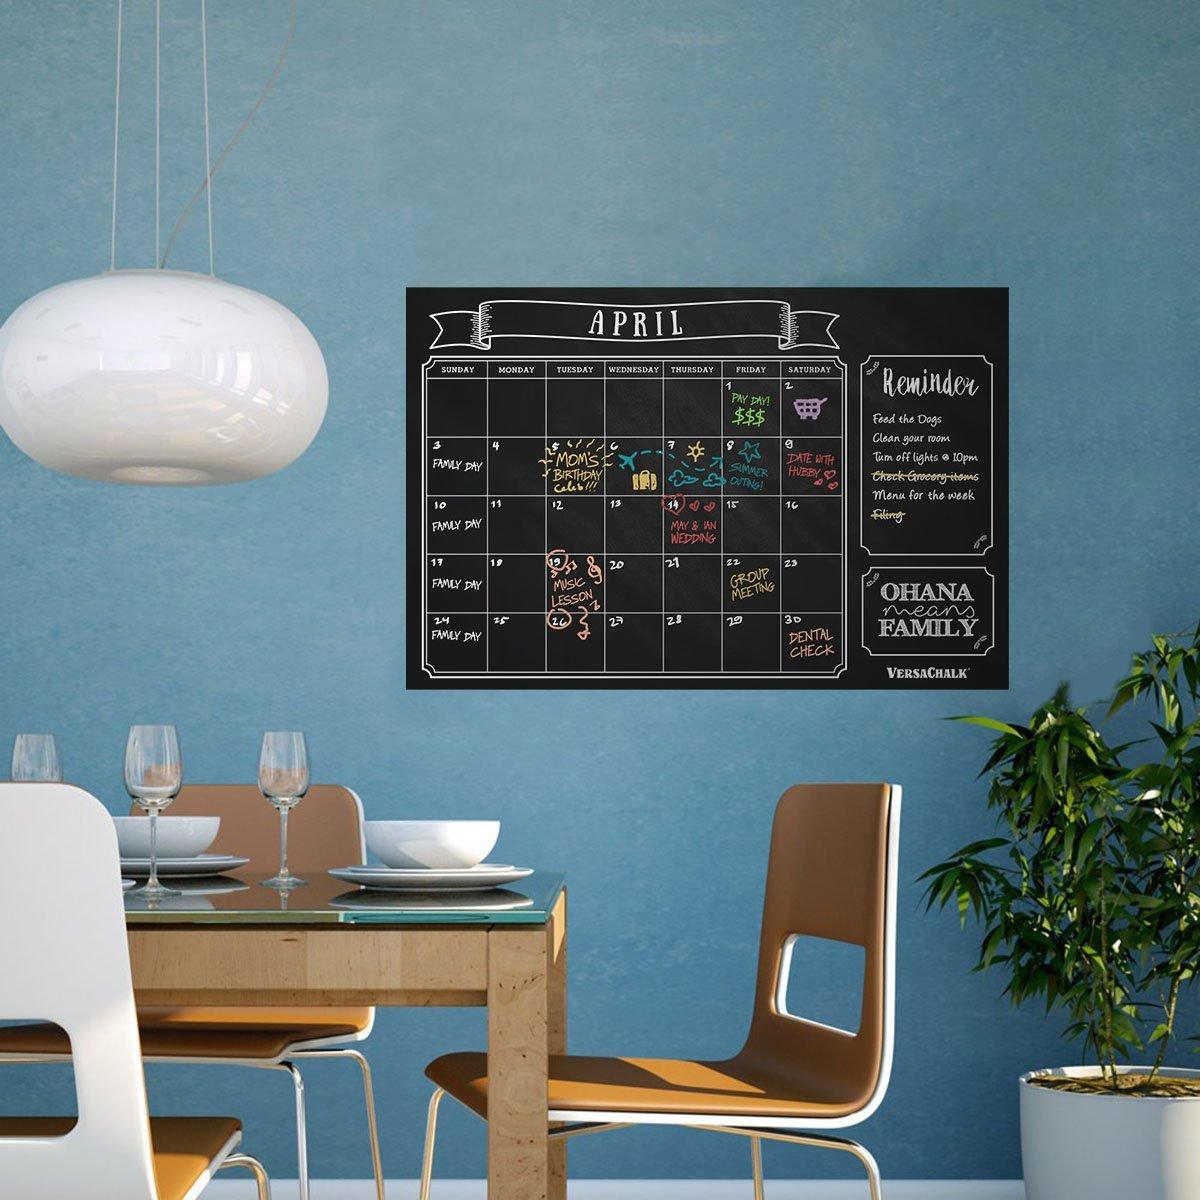 Amazon.com : Large Erasable Chalkboard Calendar Wall Decal Sticker ...